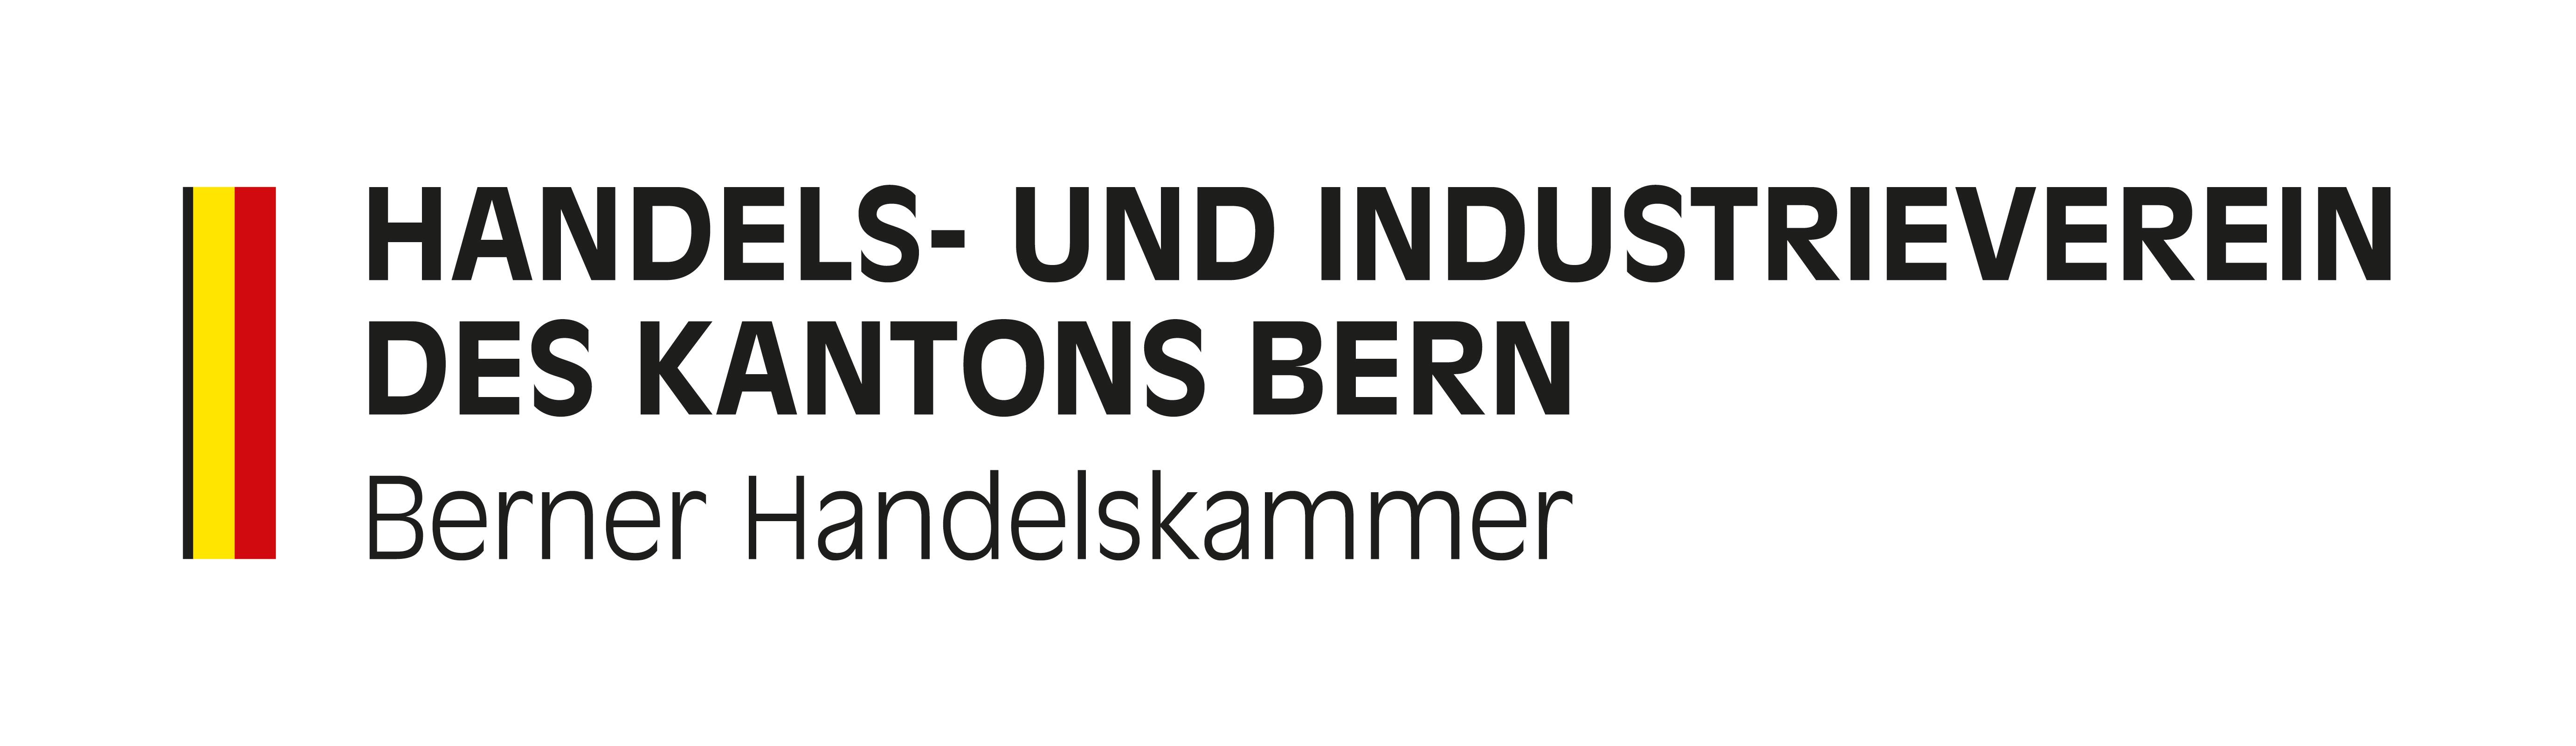 Logo Berner Handelskammer